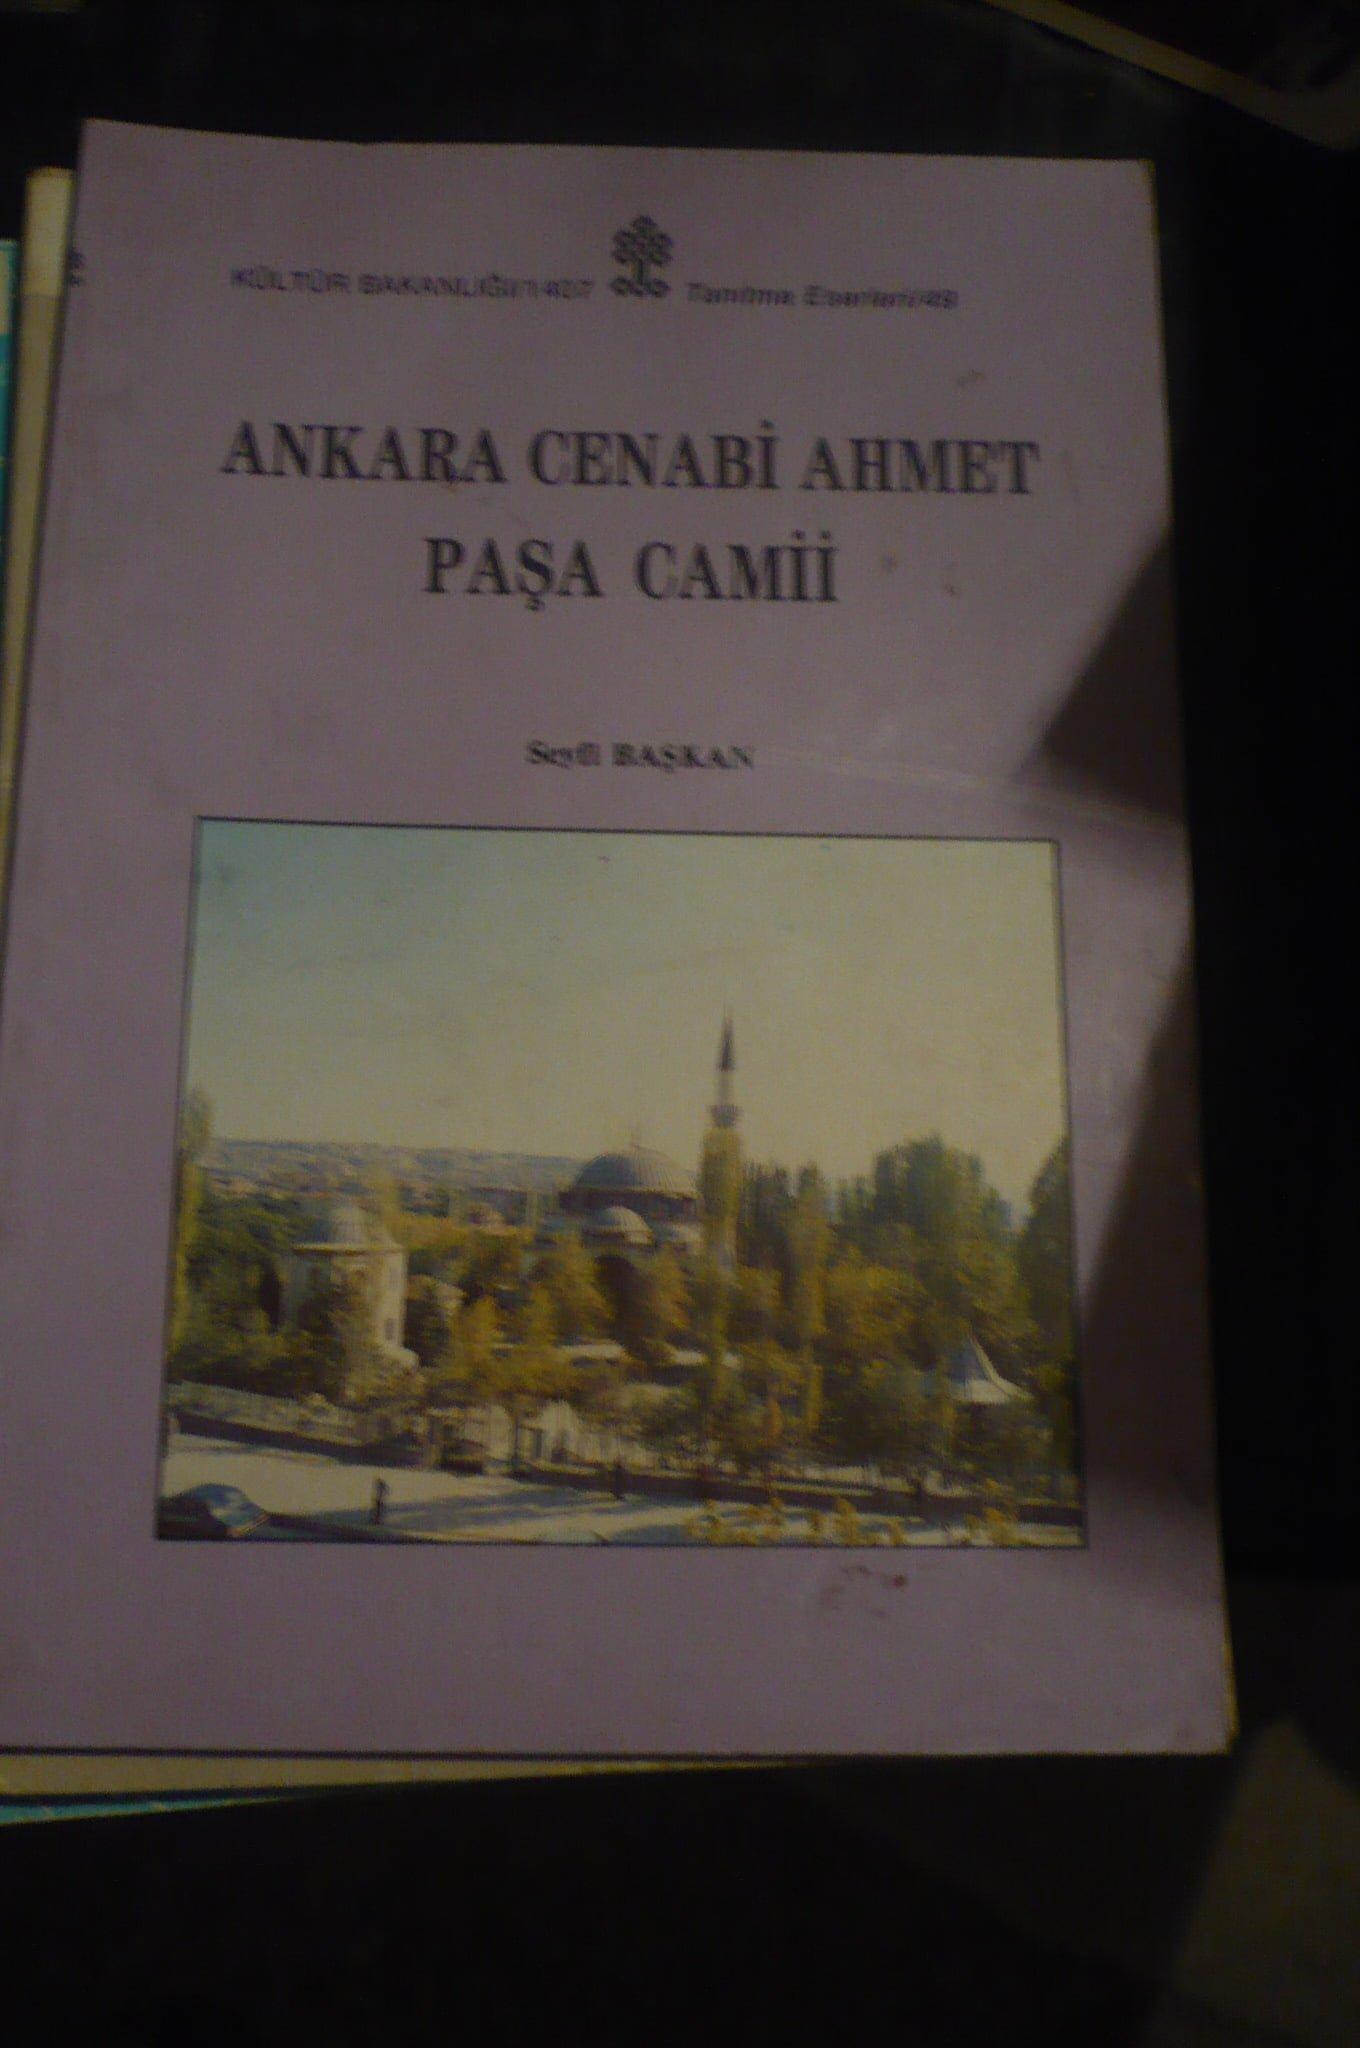 ANKARA CENABİ AHMET PAŞA CAMİİ/ Seyfi BAŞKAN/ 15 tl